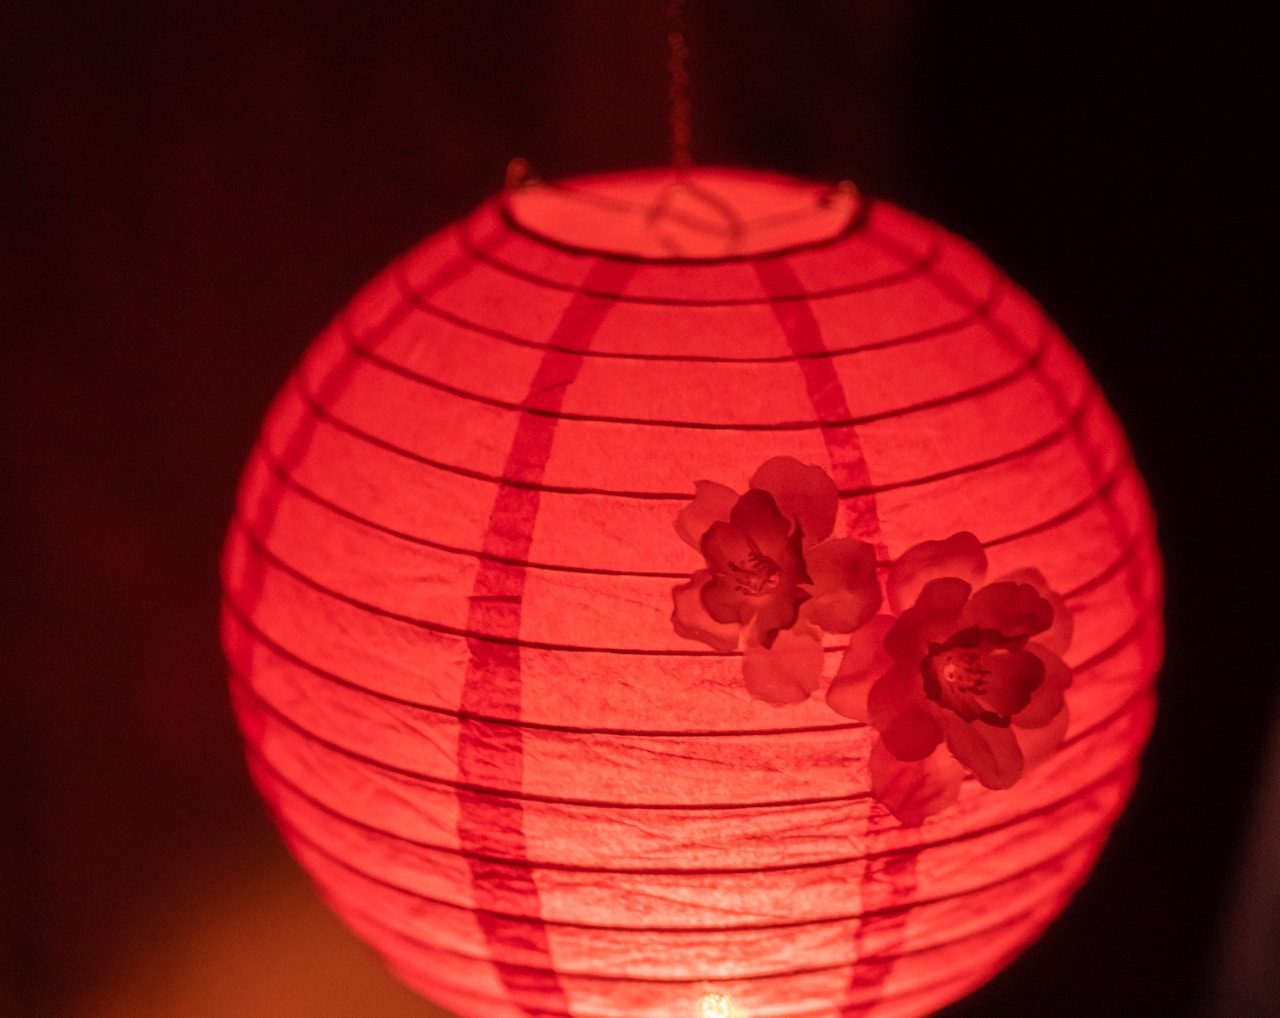 lighted circluar decorative element image